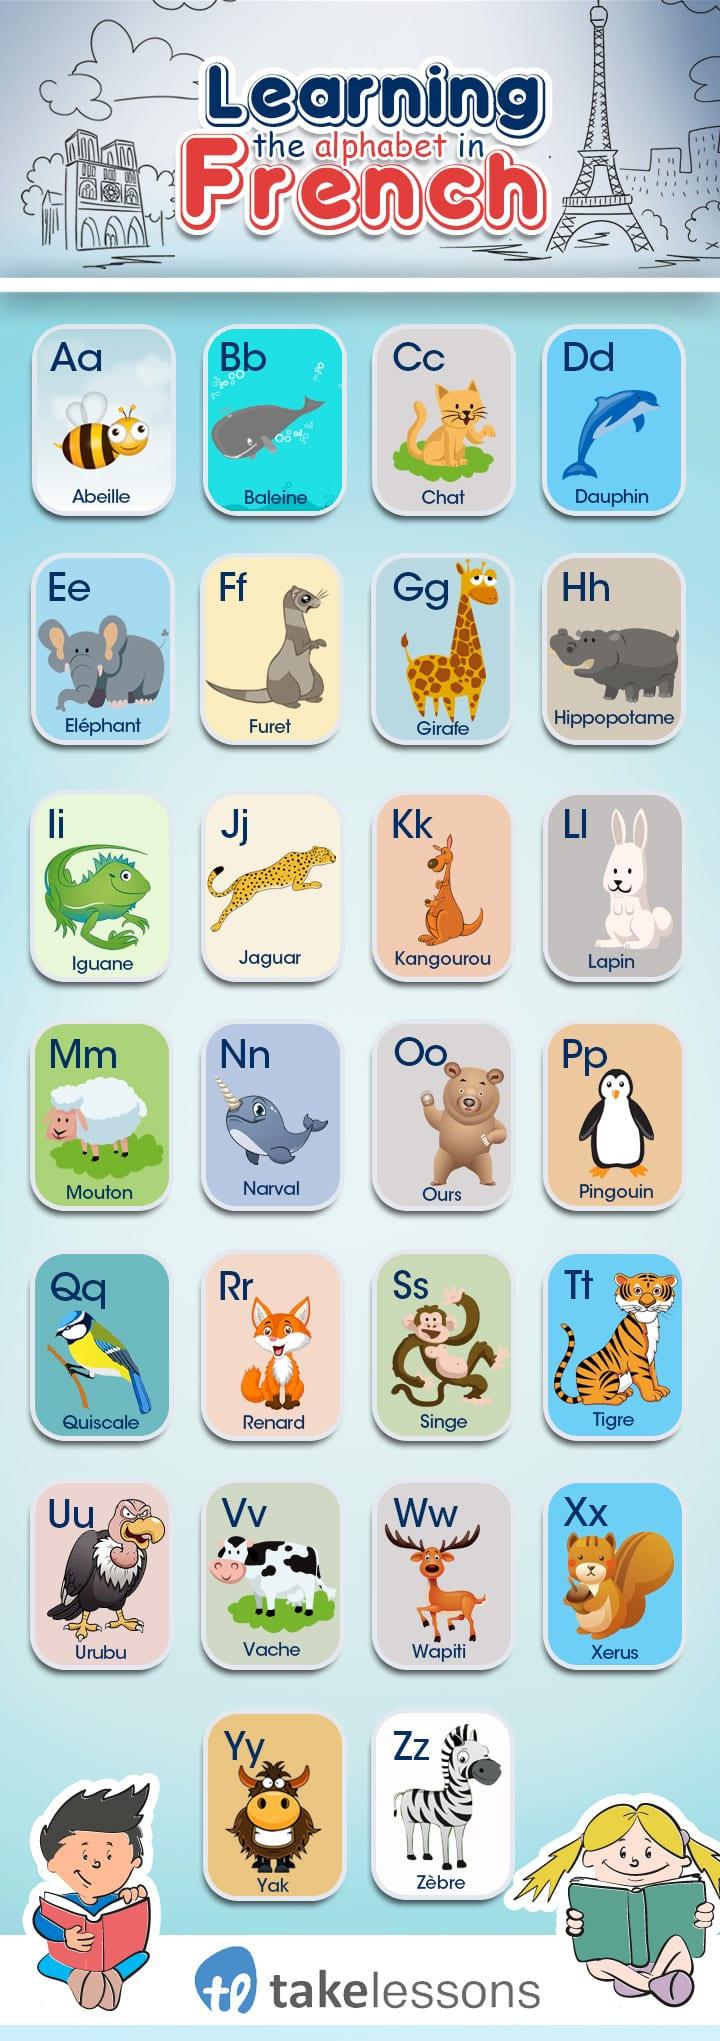 French Animal Alphabet Flashcards